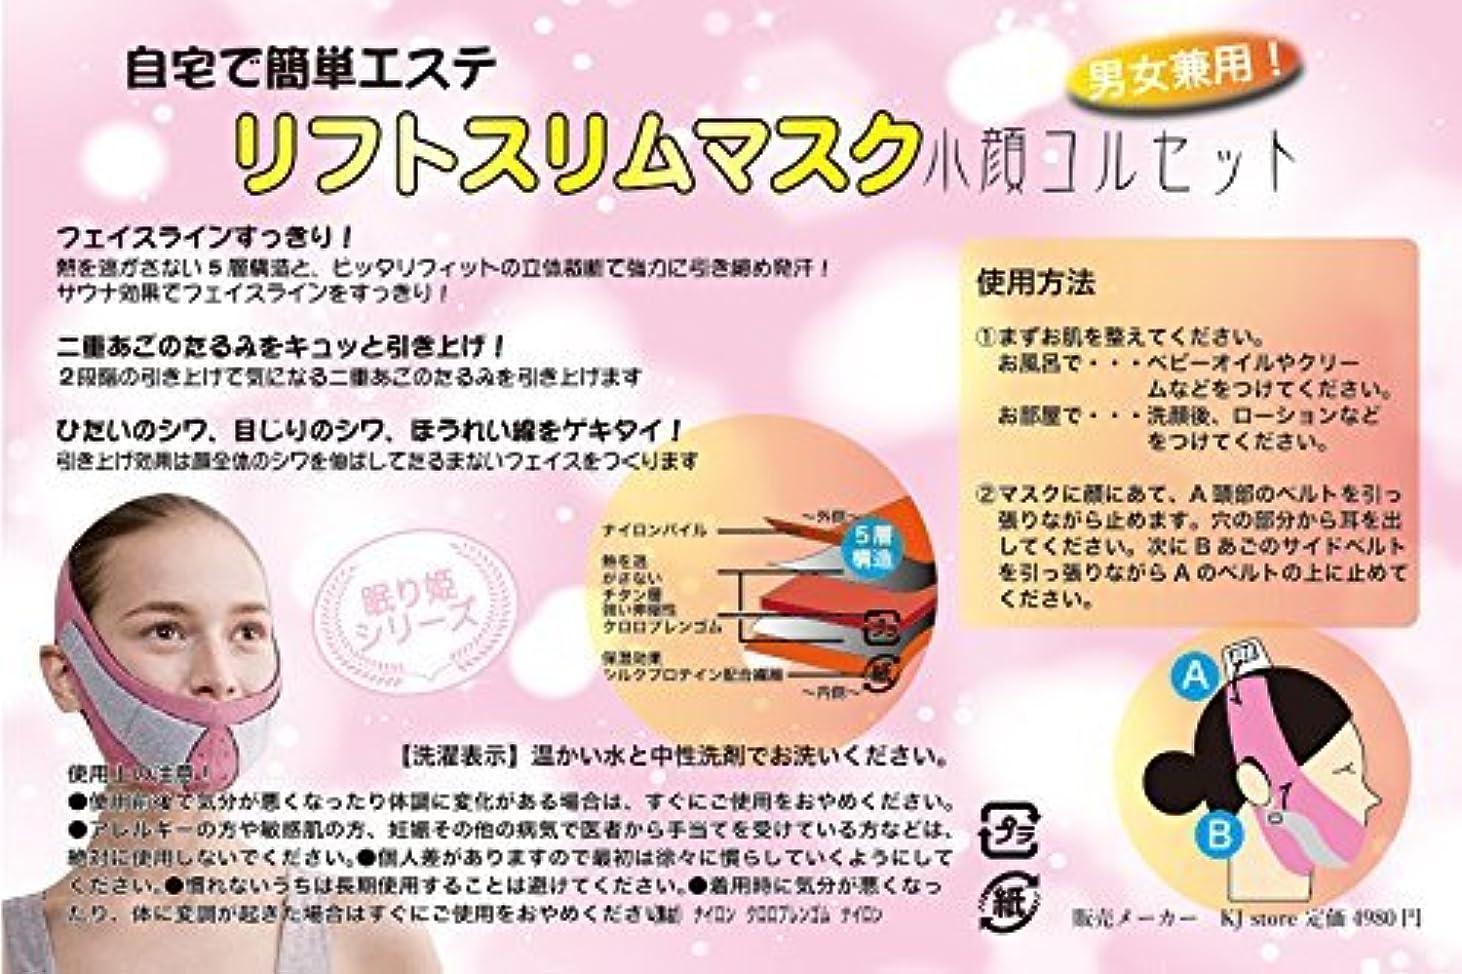 KJ 2019モデル【 眠り姫 シリーズ 】リフトスリムマスク 男女兼用 小顔コルセット